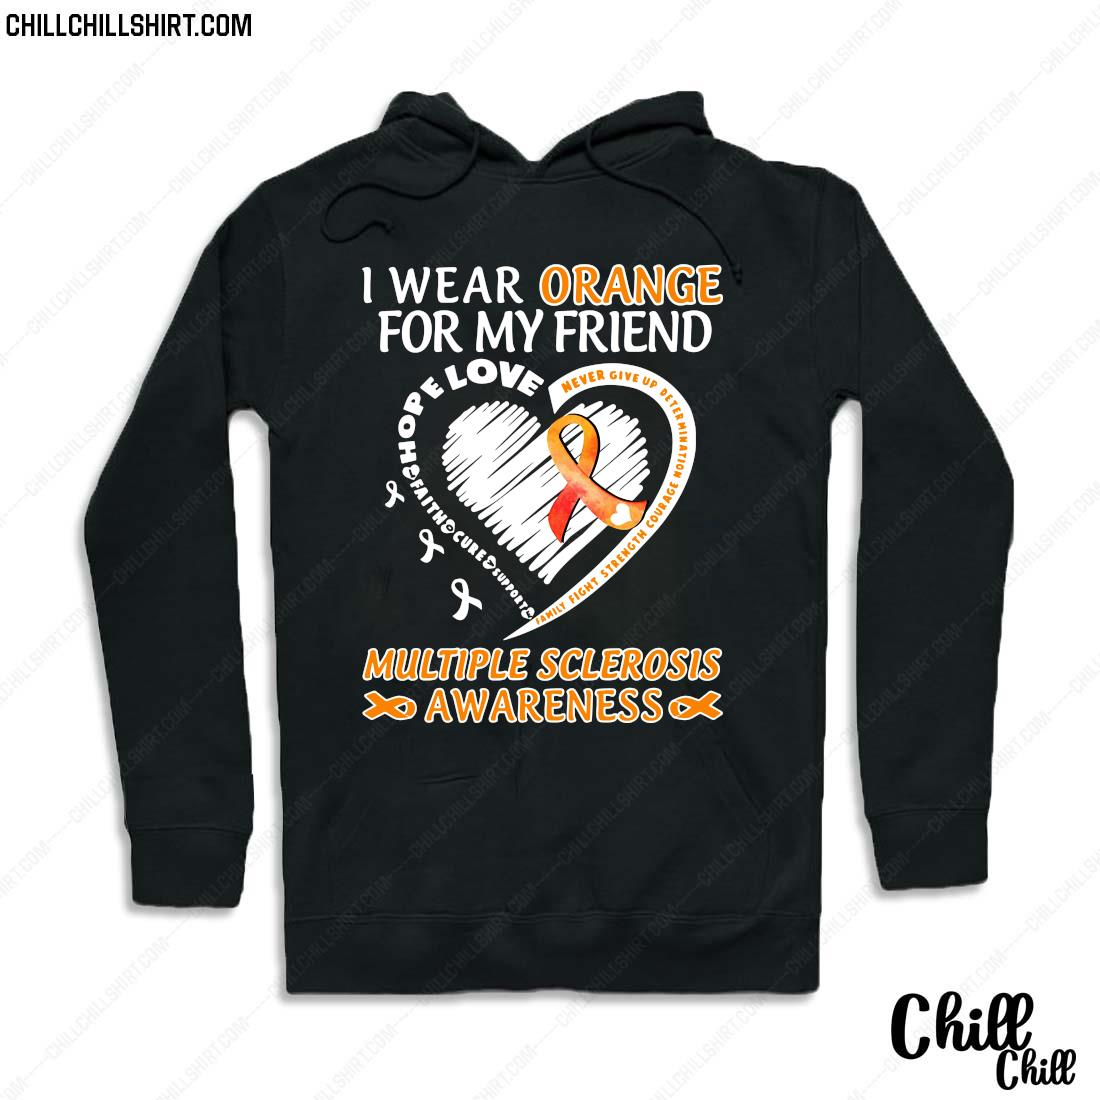 I Wear Orange For My Friend Multiple Sclerosis Awareness Shirt Hoodie